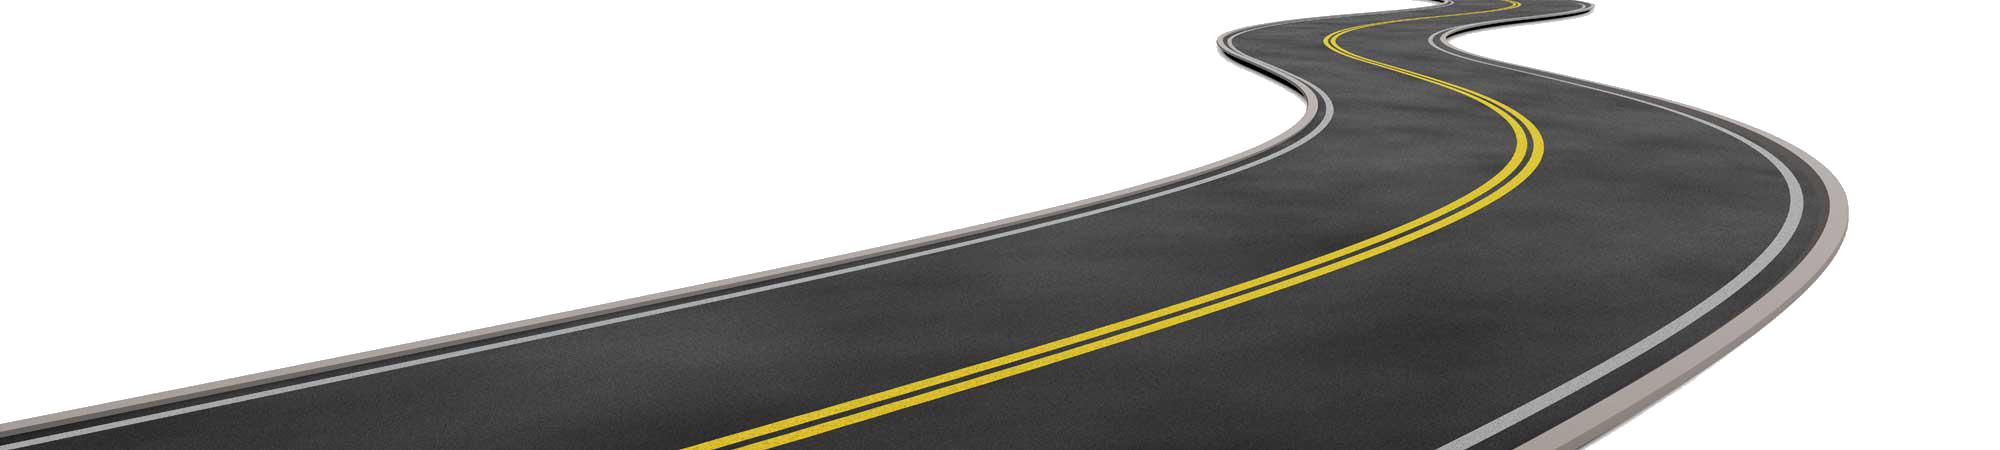 Road PNG images, highway PNG download.